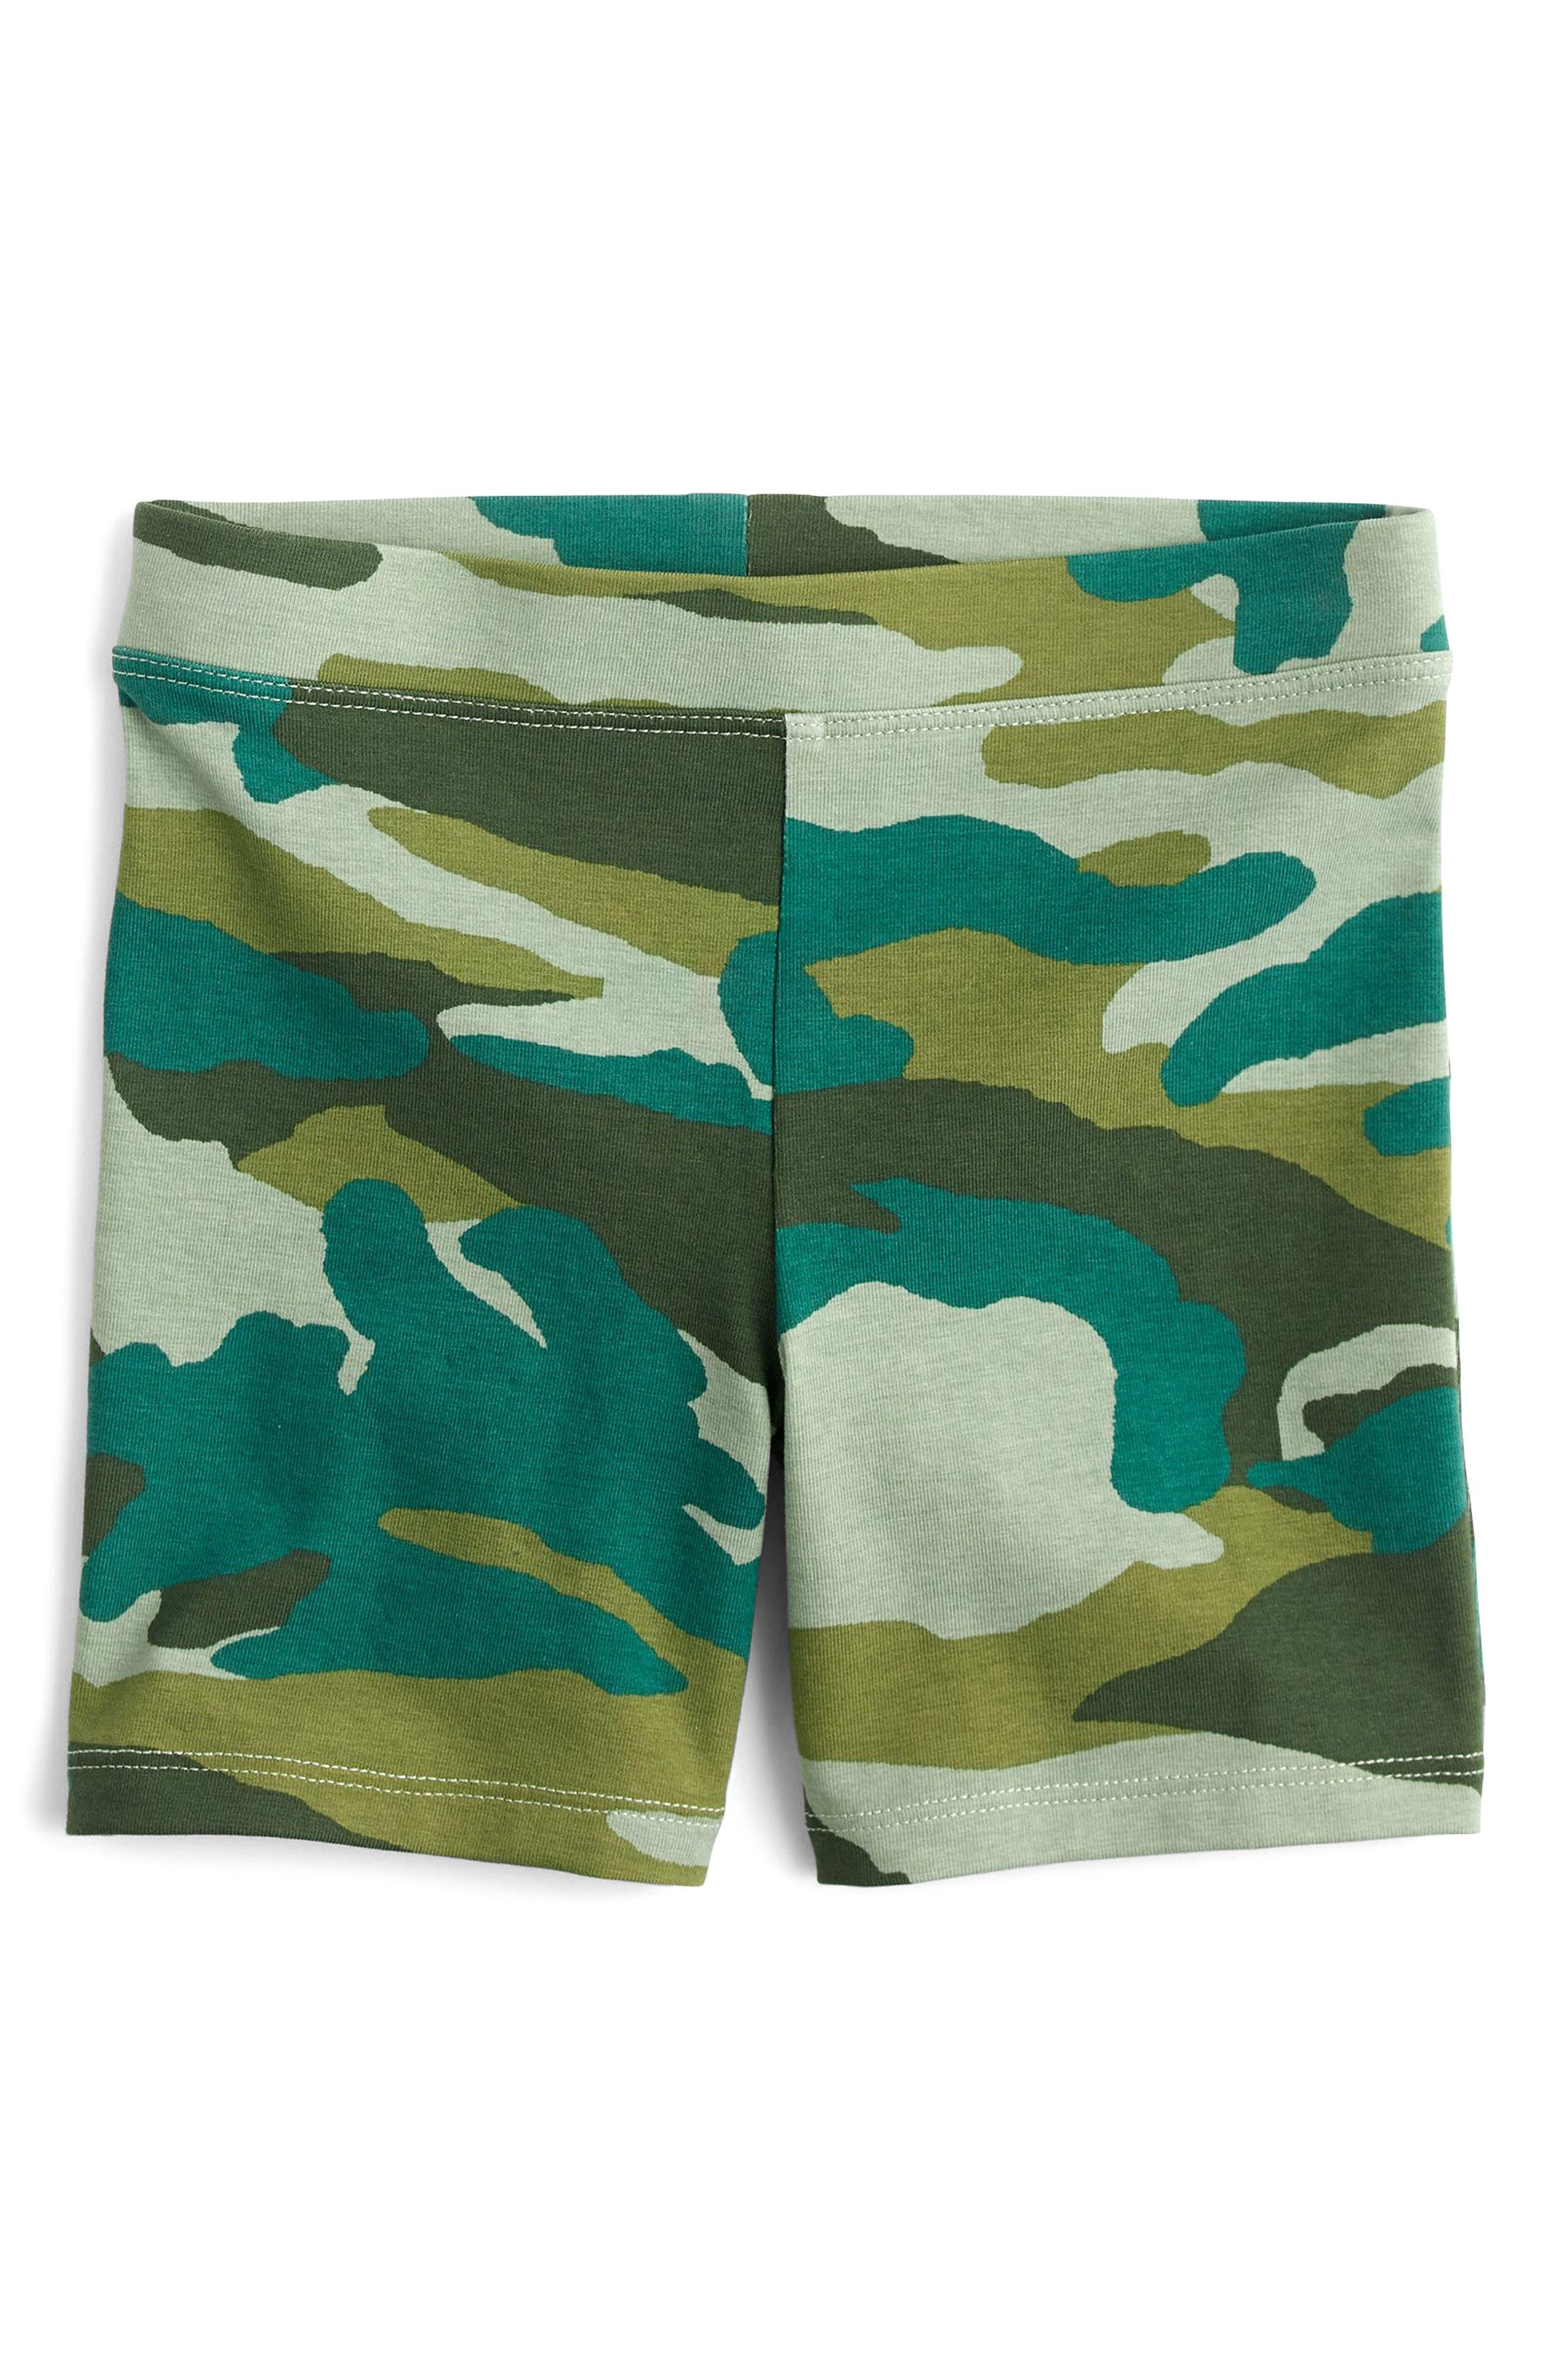 Camo Bike Shorts,                         Main,                         color, 300